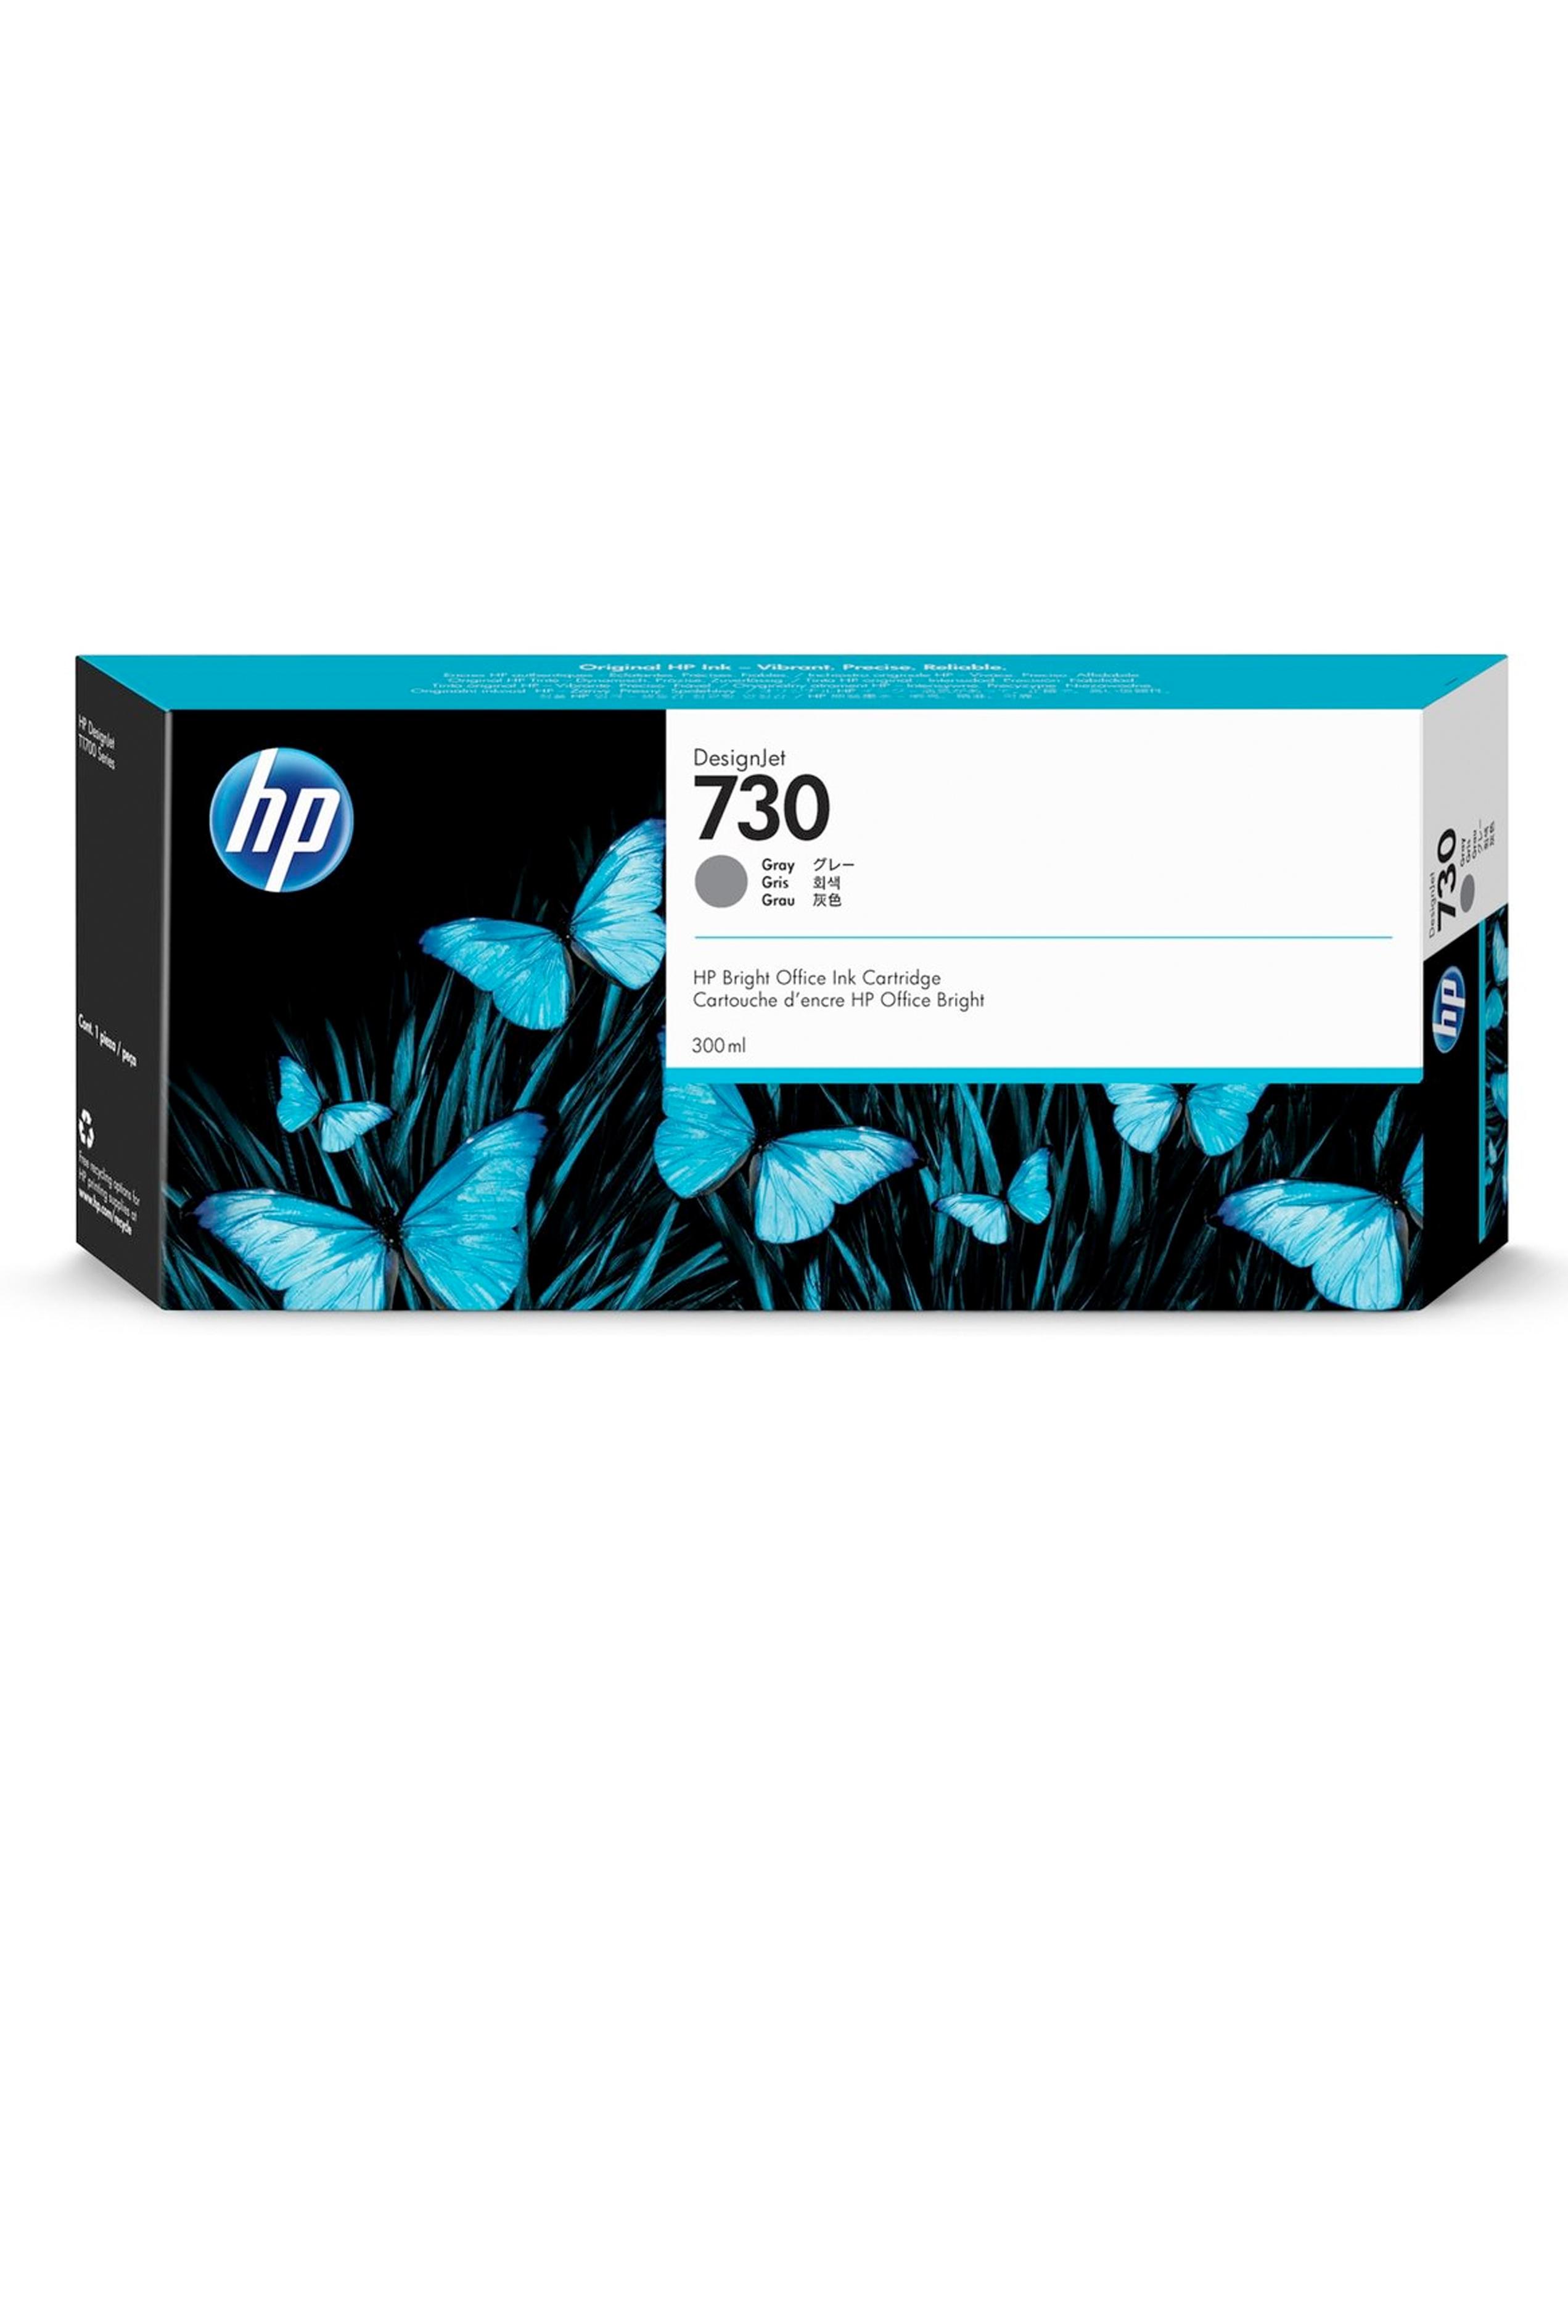 HP 730 300-ml Gray DesignJet Ink Cartridge (P2V72A)